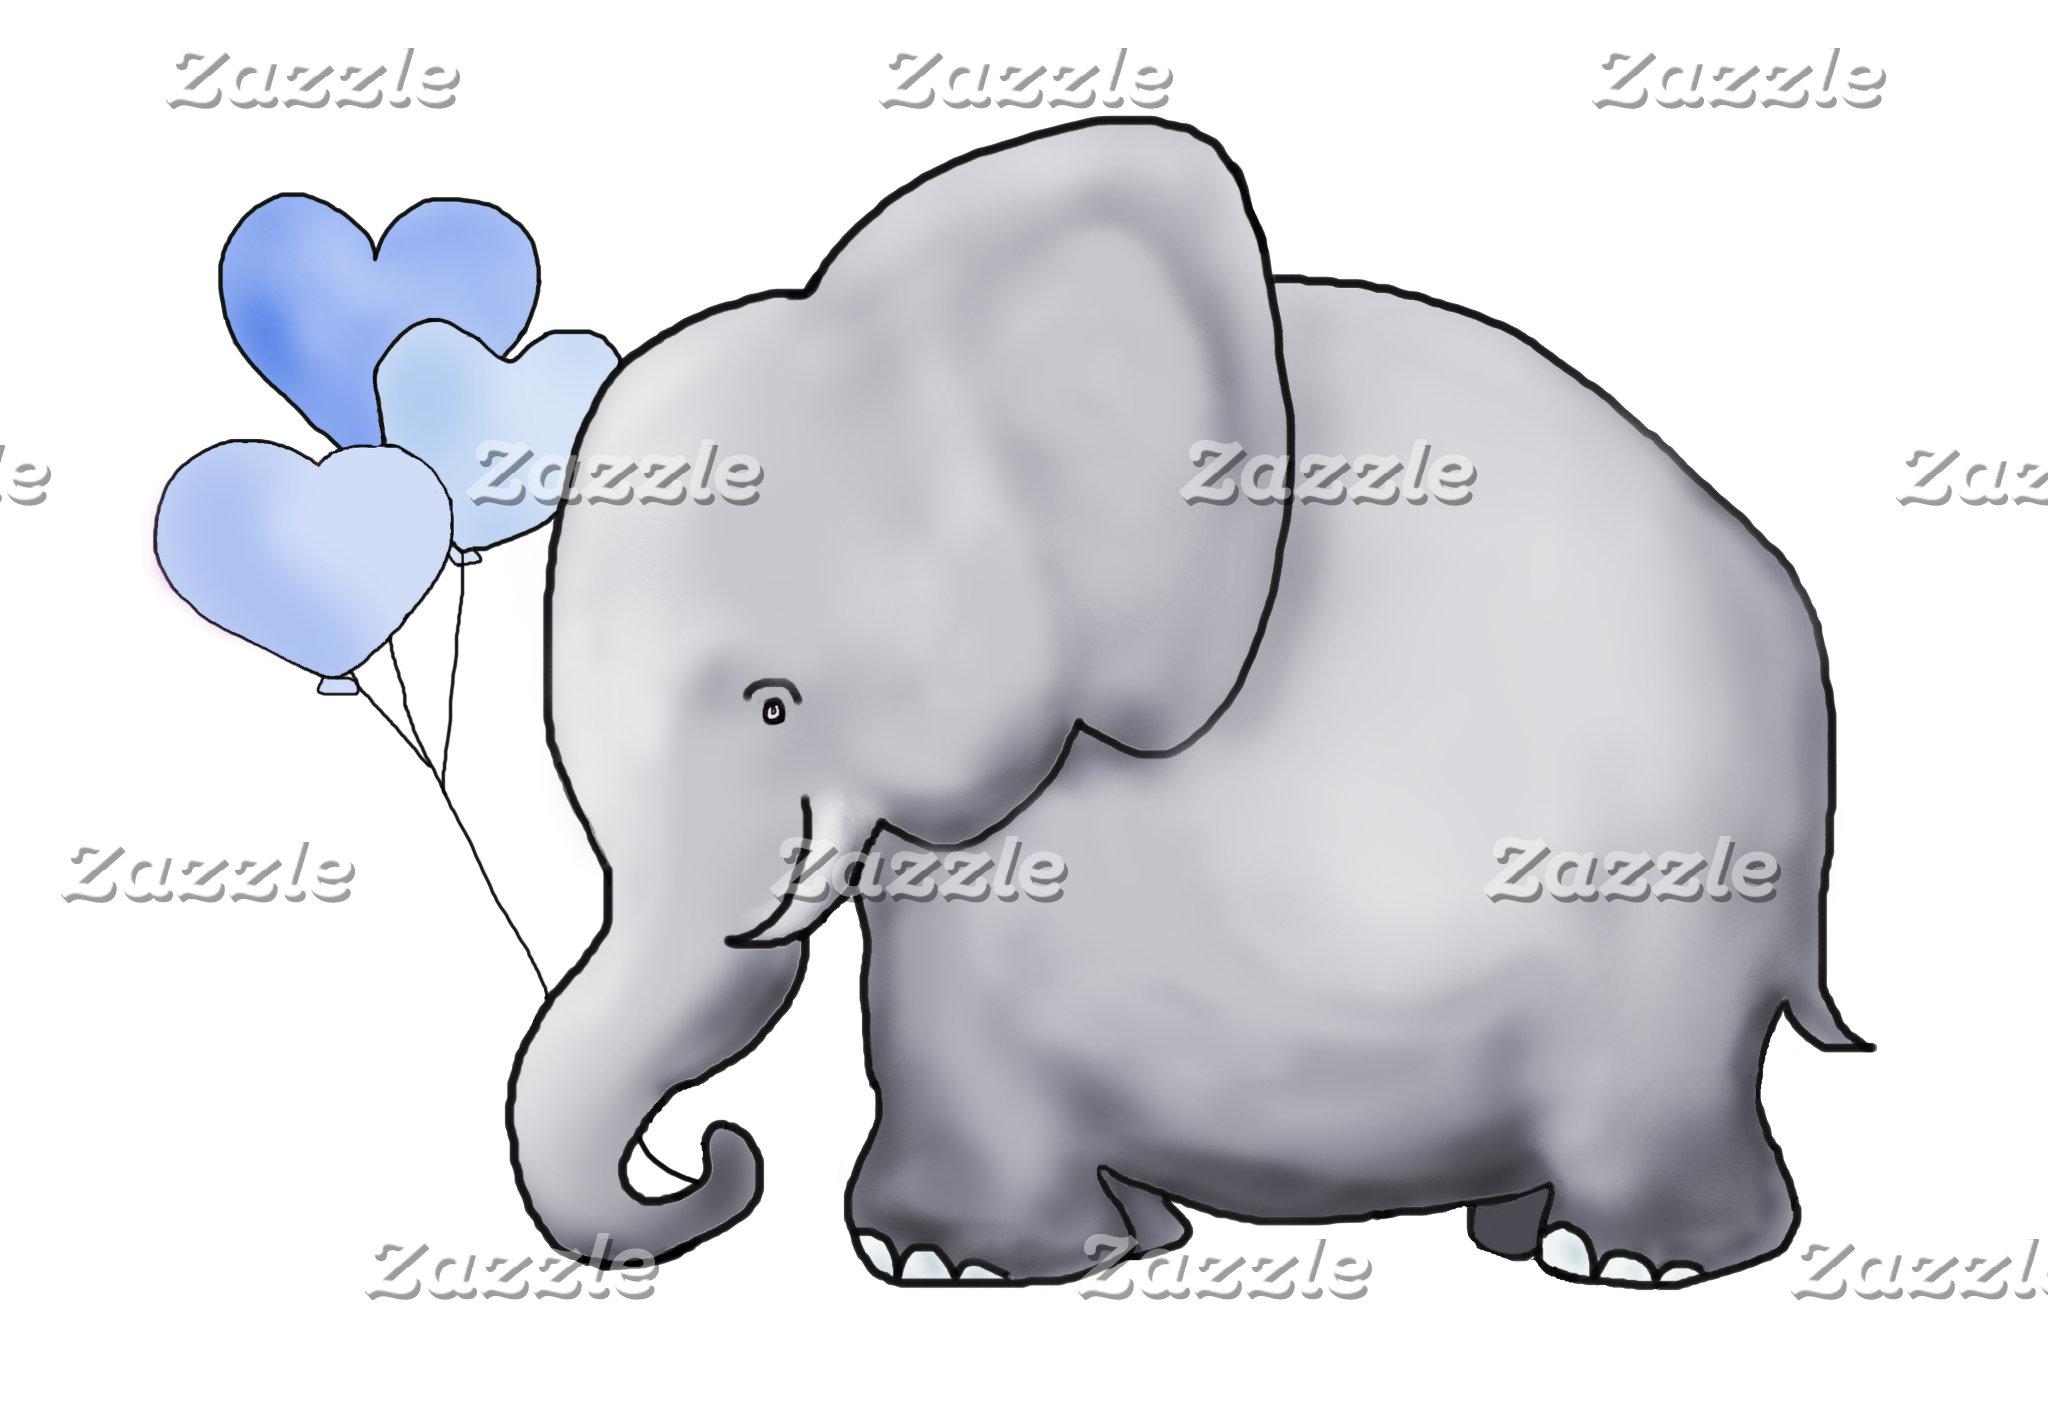 Heart Balloon Elephant - Baby in the Car